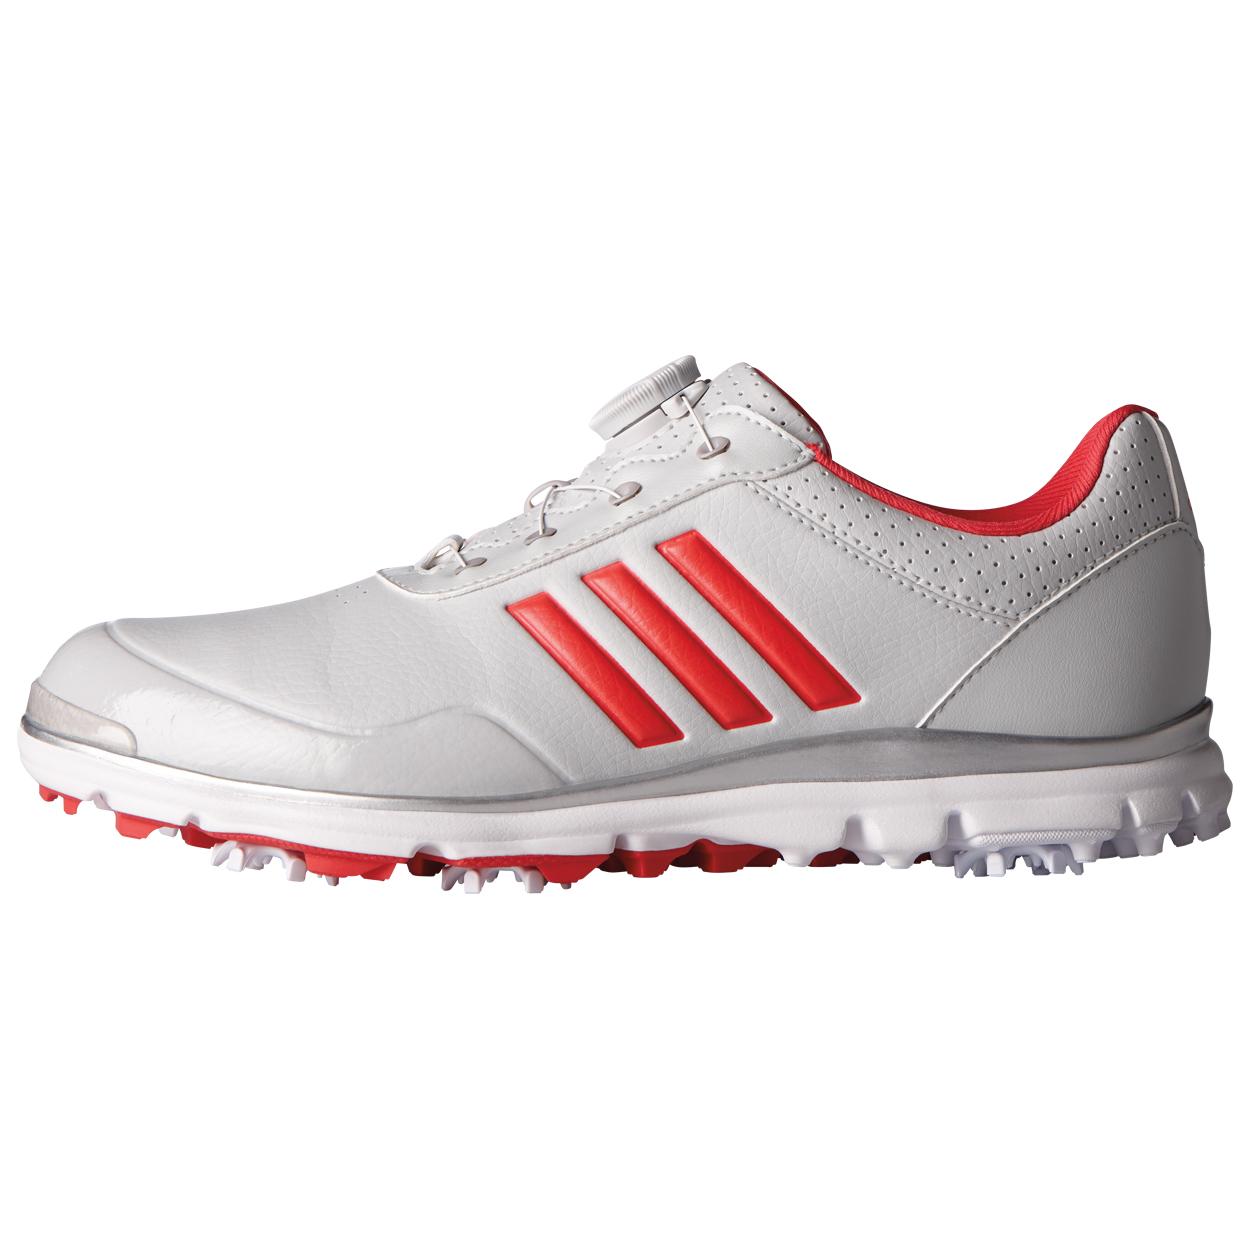 best website 0bc88 5b482 Adidas Womens adistar Lite Boa Golf Shoe